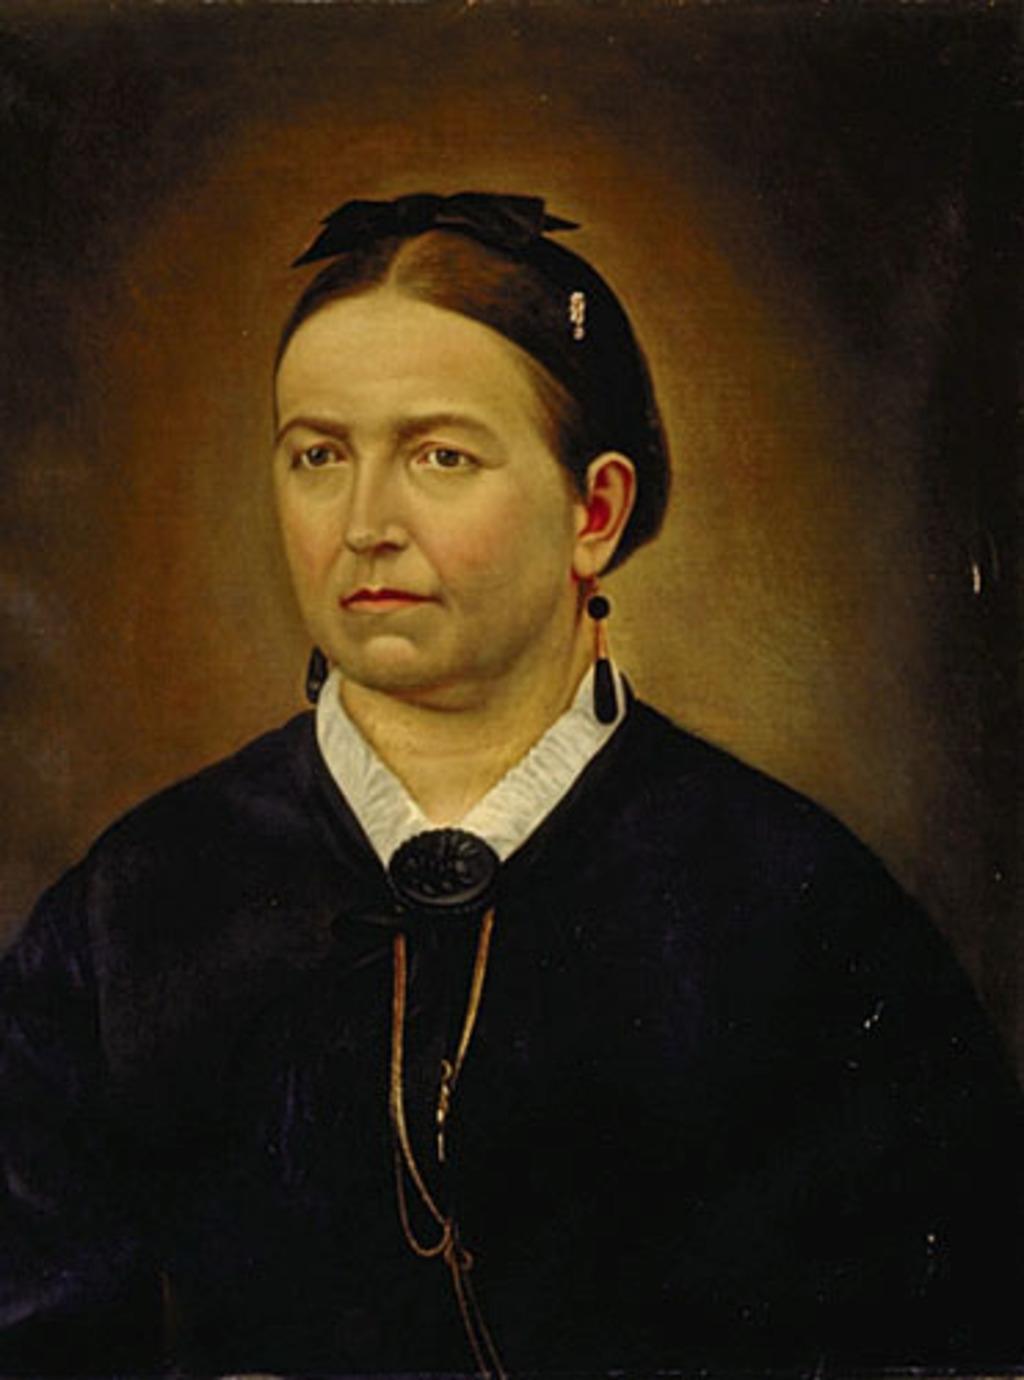 Madame Eugène Larue, née Lucille Grenier